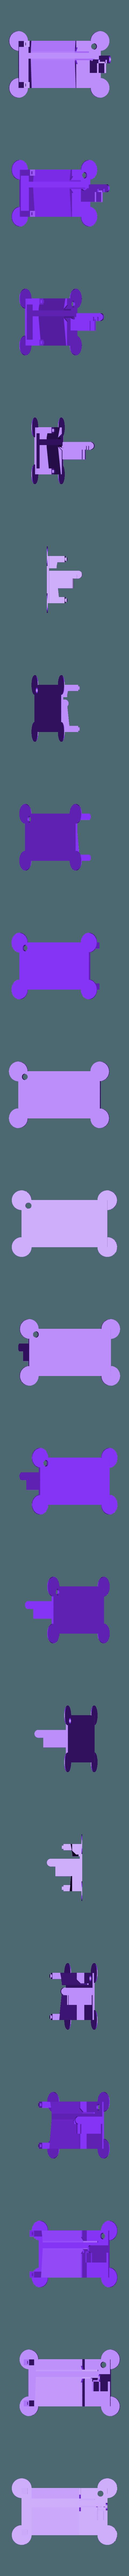 "Track_Base_New.stl Download free STL file Marblevator ""Mini"", Zigzag Edition Track • 3D print design, gzumwalt"